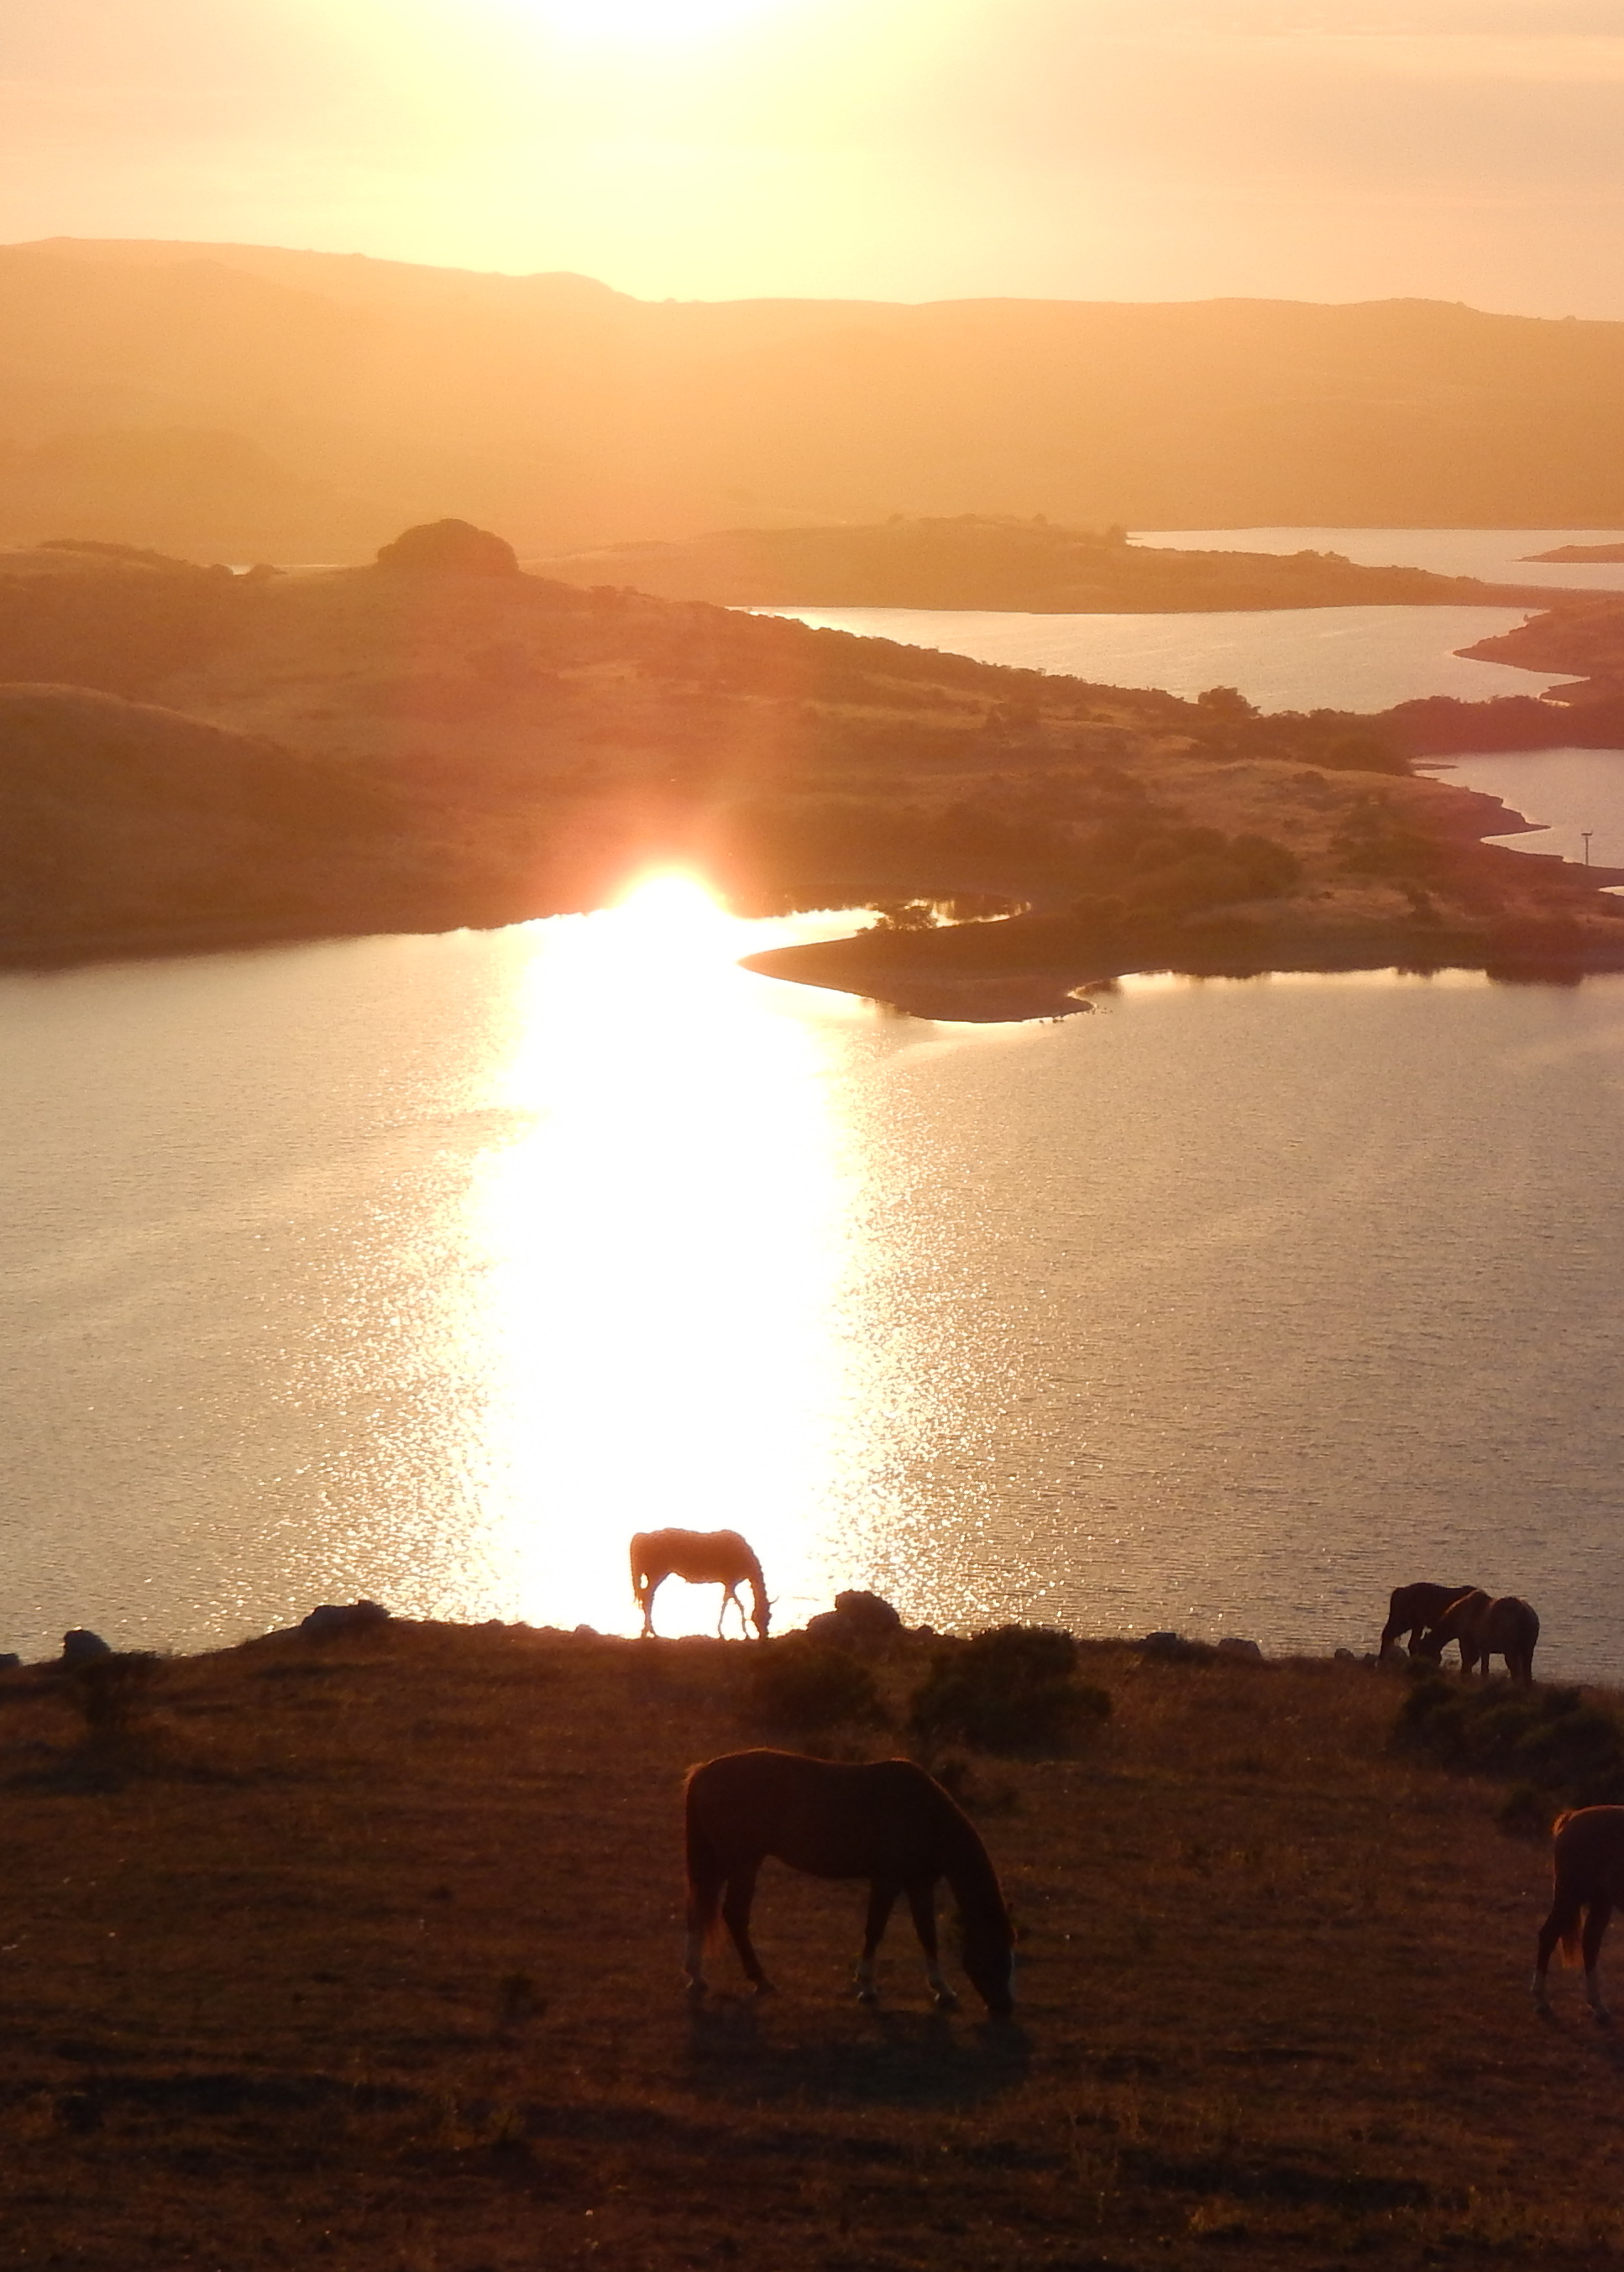 Danehills foal inAugust red sunset.JPG